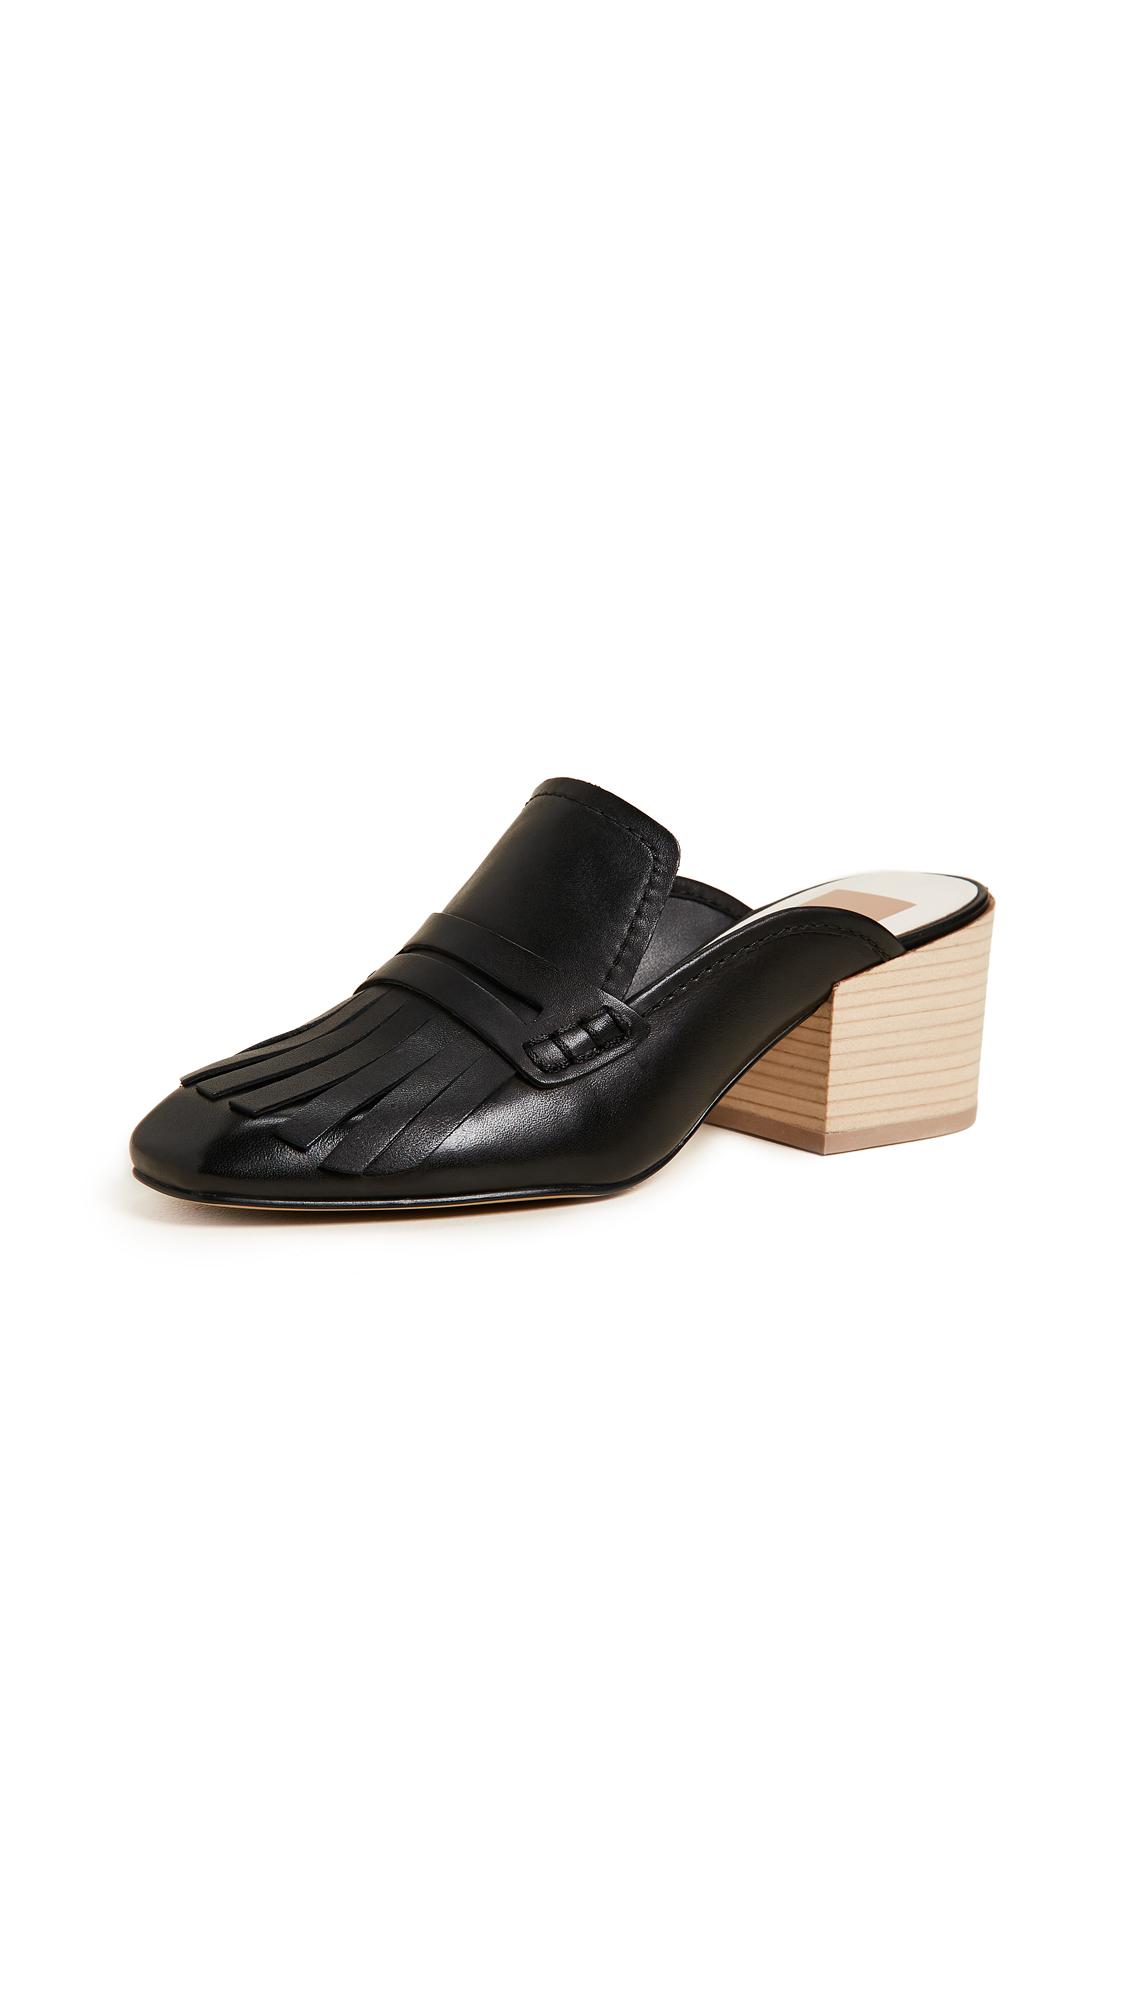 Dolce Vita Katina Block Heel Pumps - Black